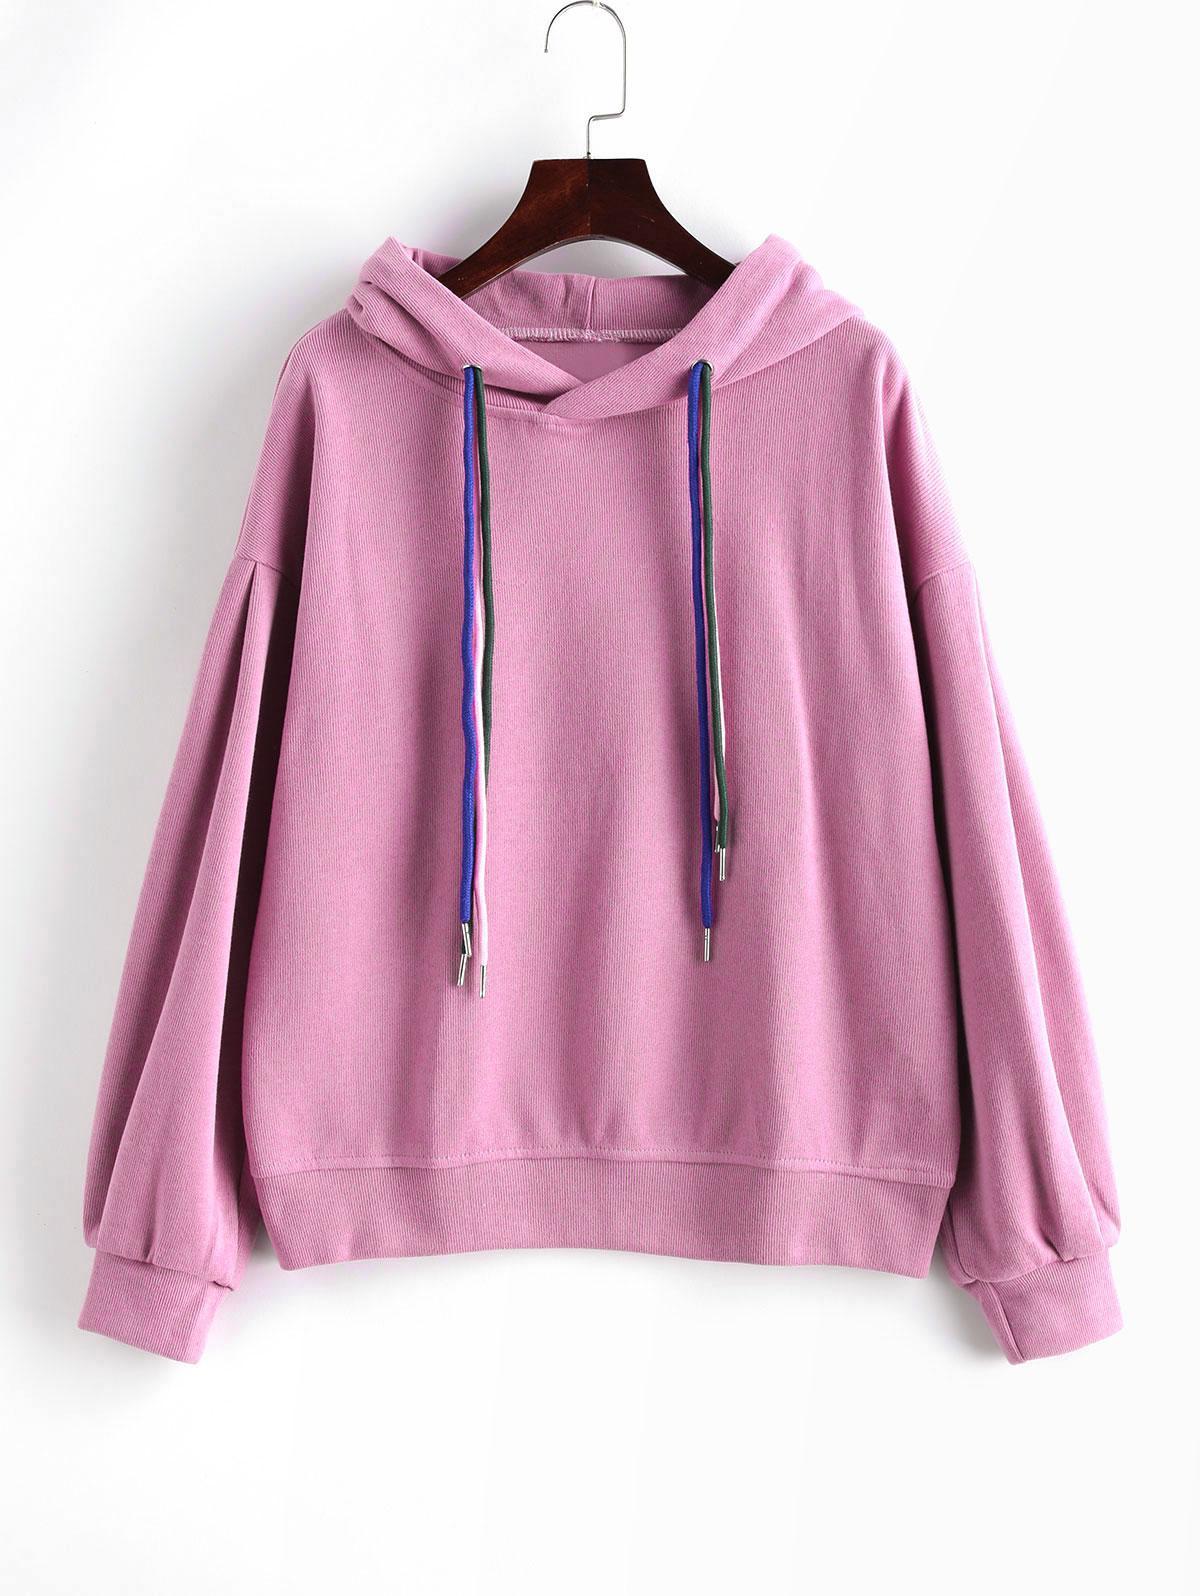 Drop Shoulder Drawstring Knit Pullover Hoodie